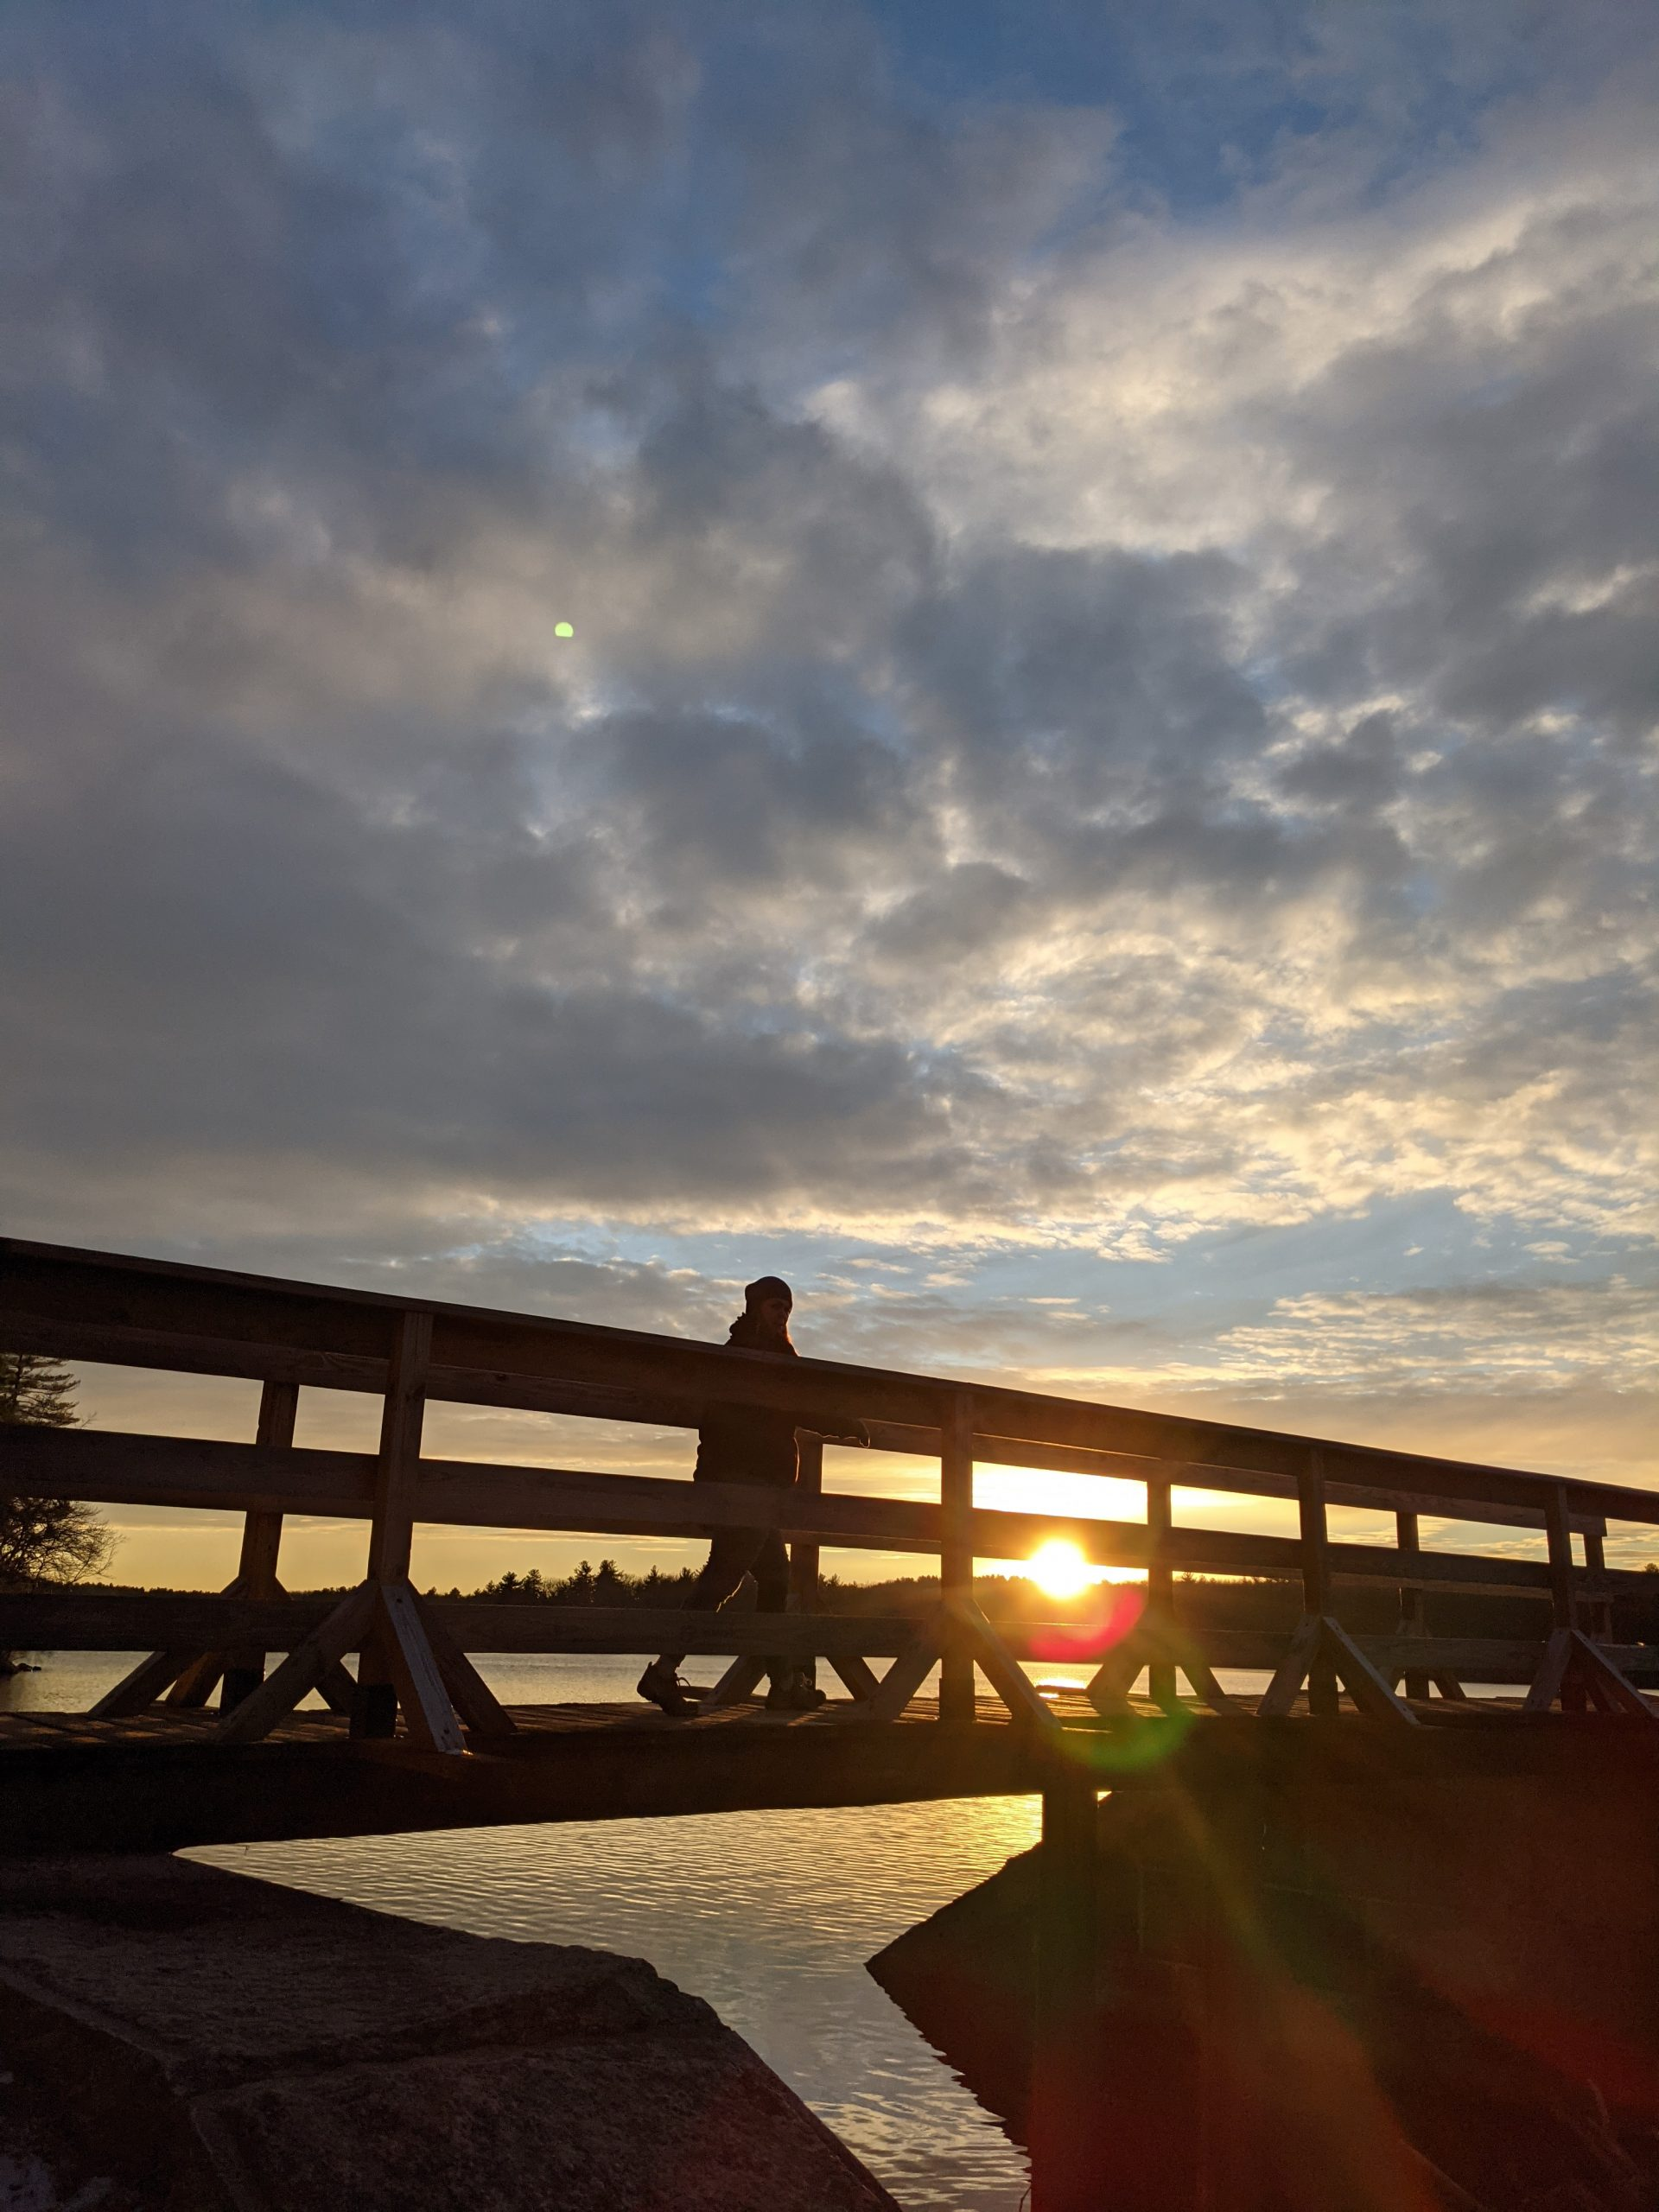 Pedestrian Bridge at Sunset Ashland State Park January 6, 2021